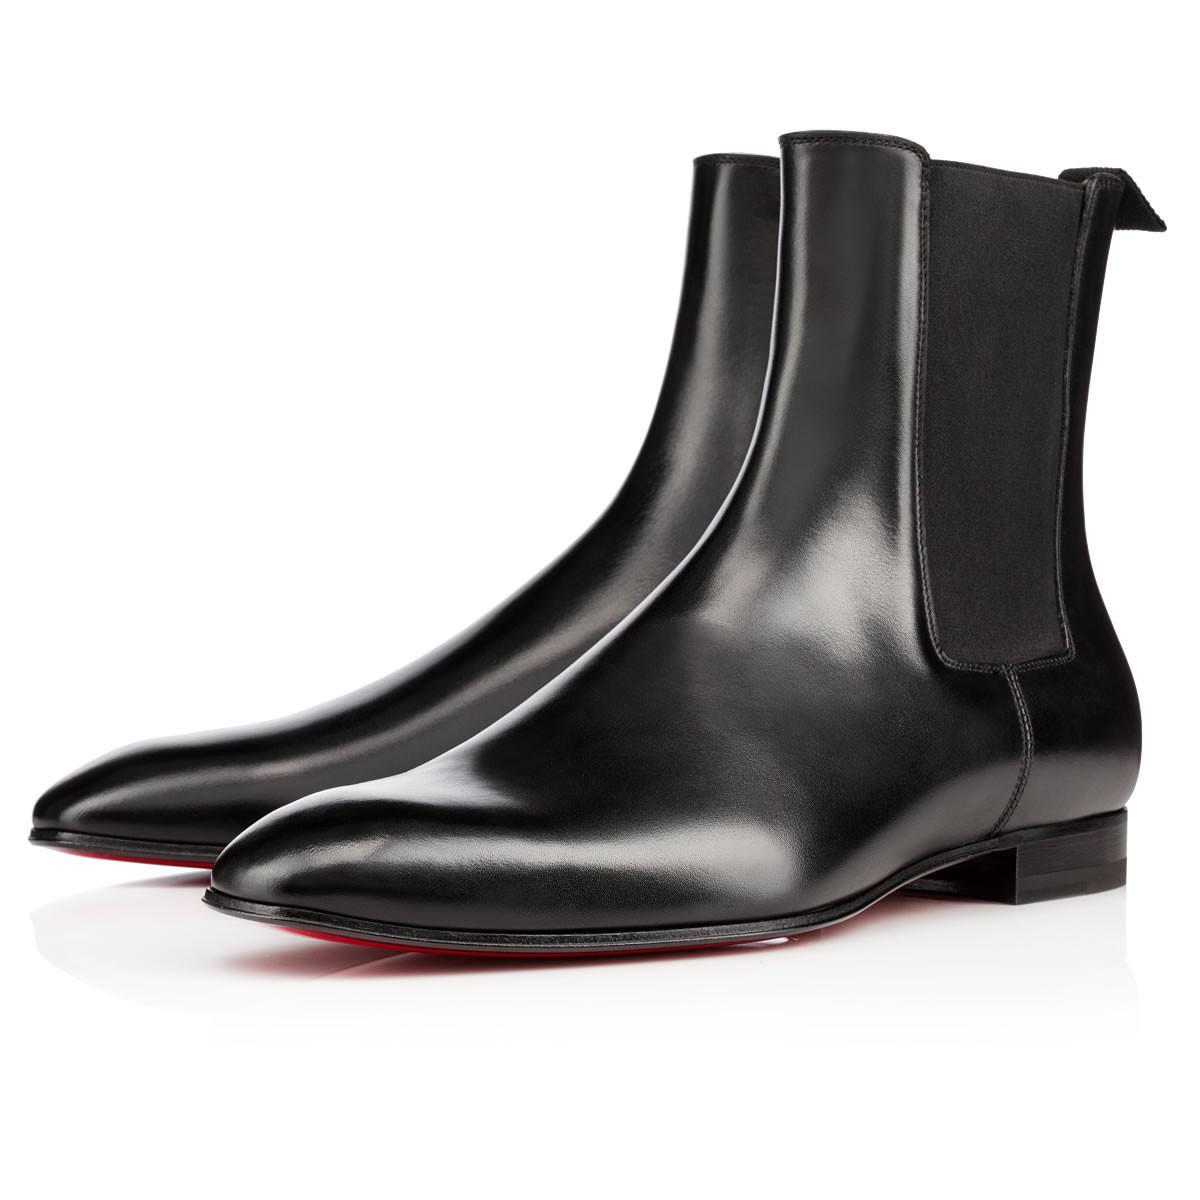 79d53aac422 Christian Louboutin Roadie Calf Black Calfskin in Black for Men - Lyst